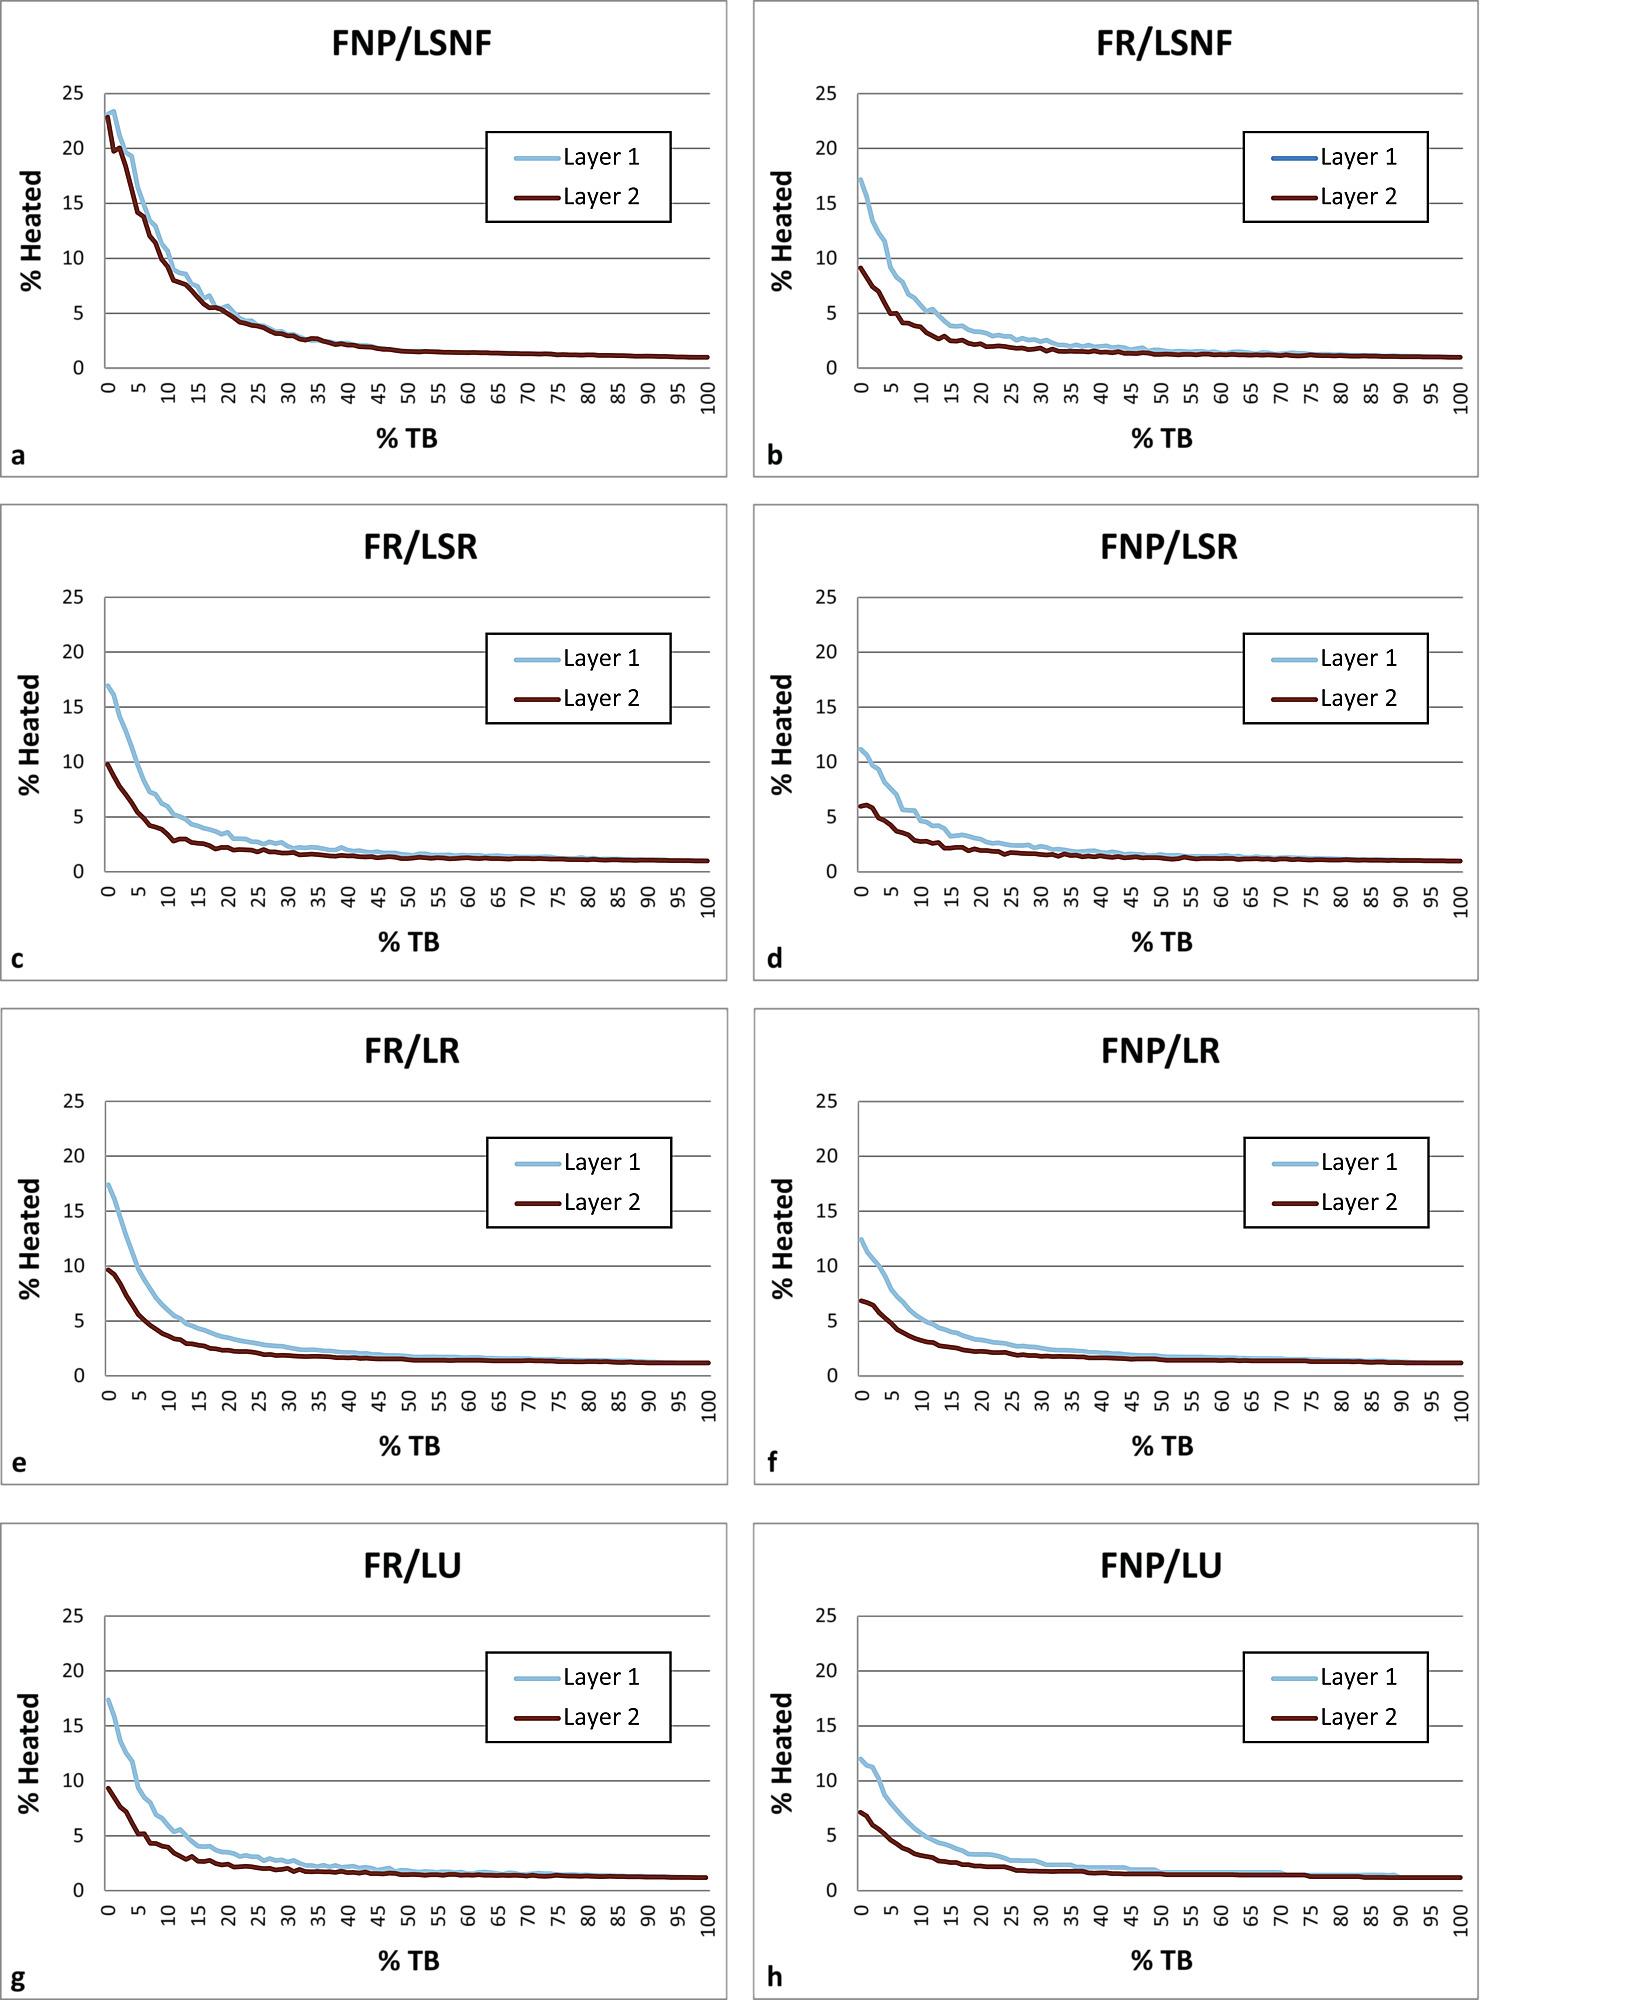 FiReproxies A Putational Model Providing Insight Into